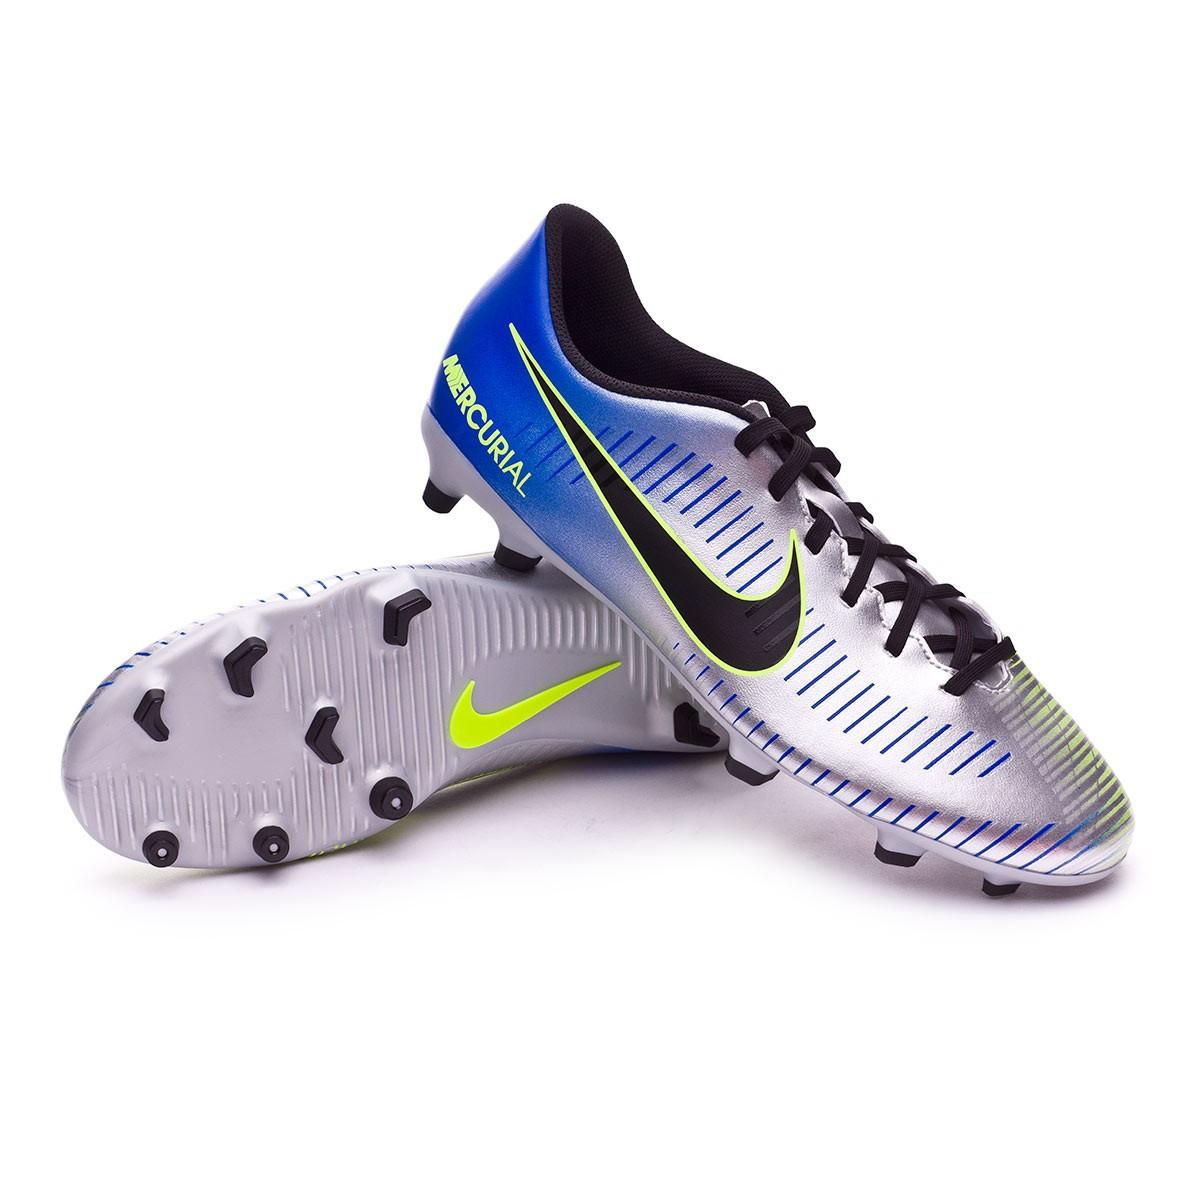 5eba461db3e Football Boots Nike Mercurial Vortex III FG Neymar Racer blue-Black ...